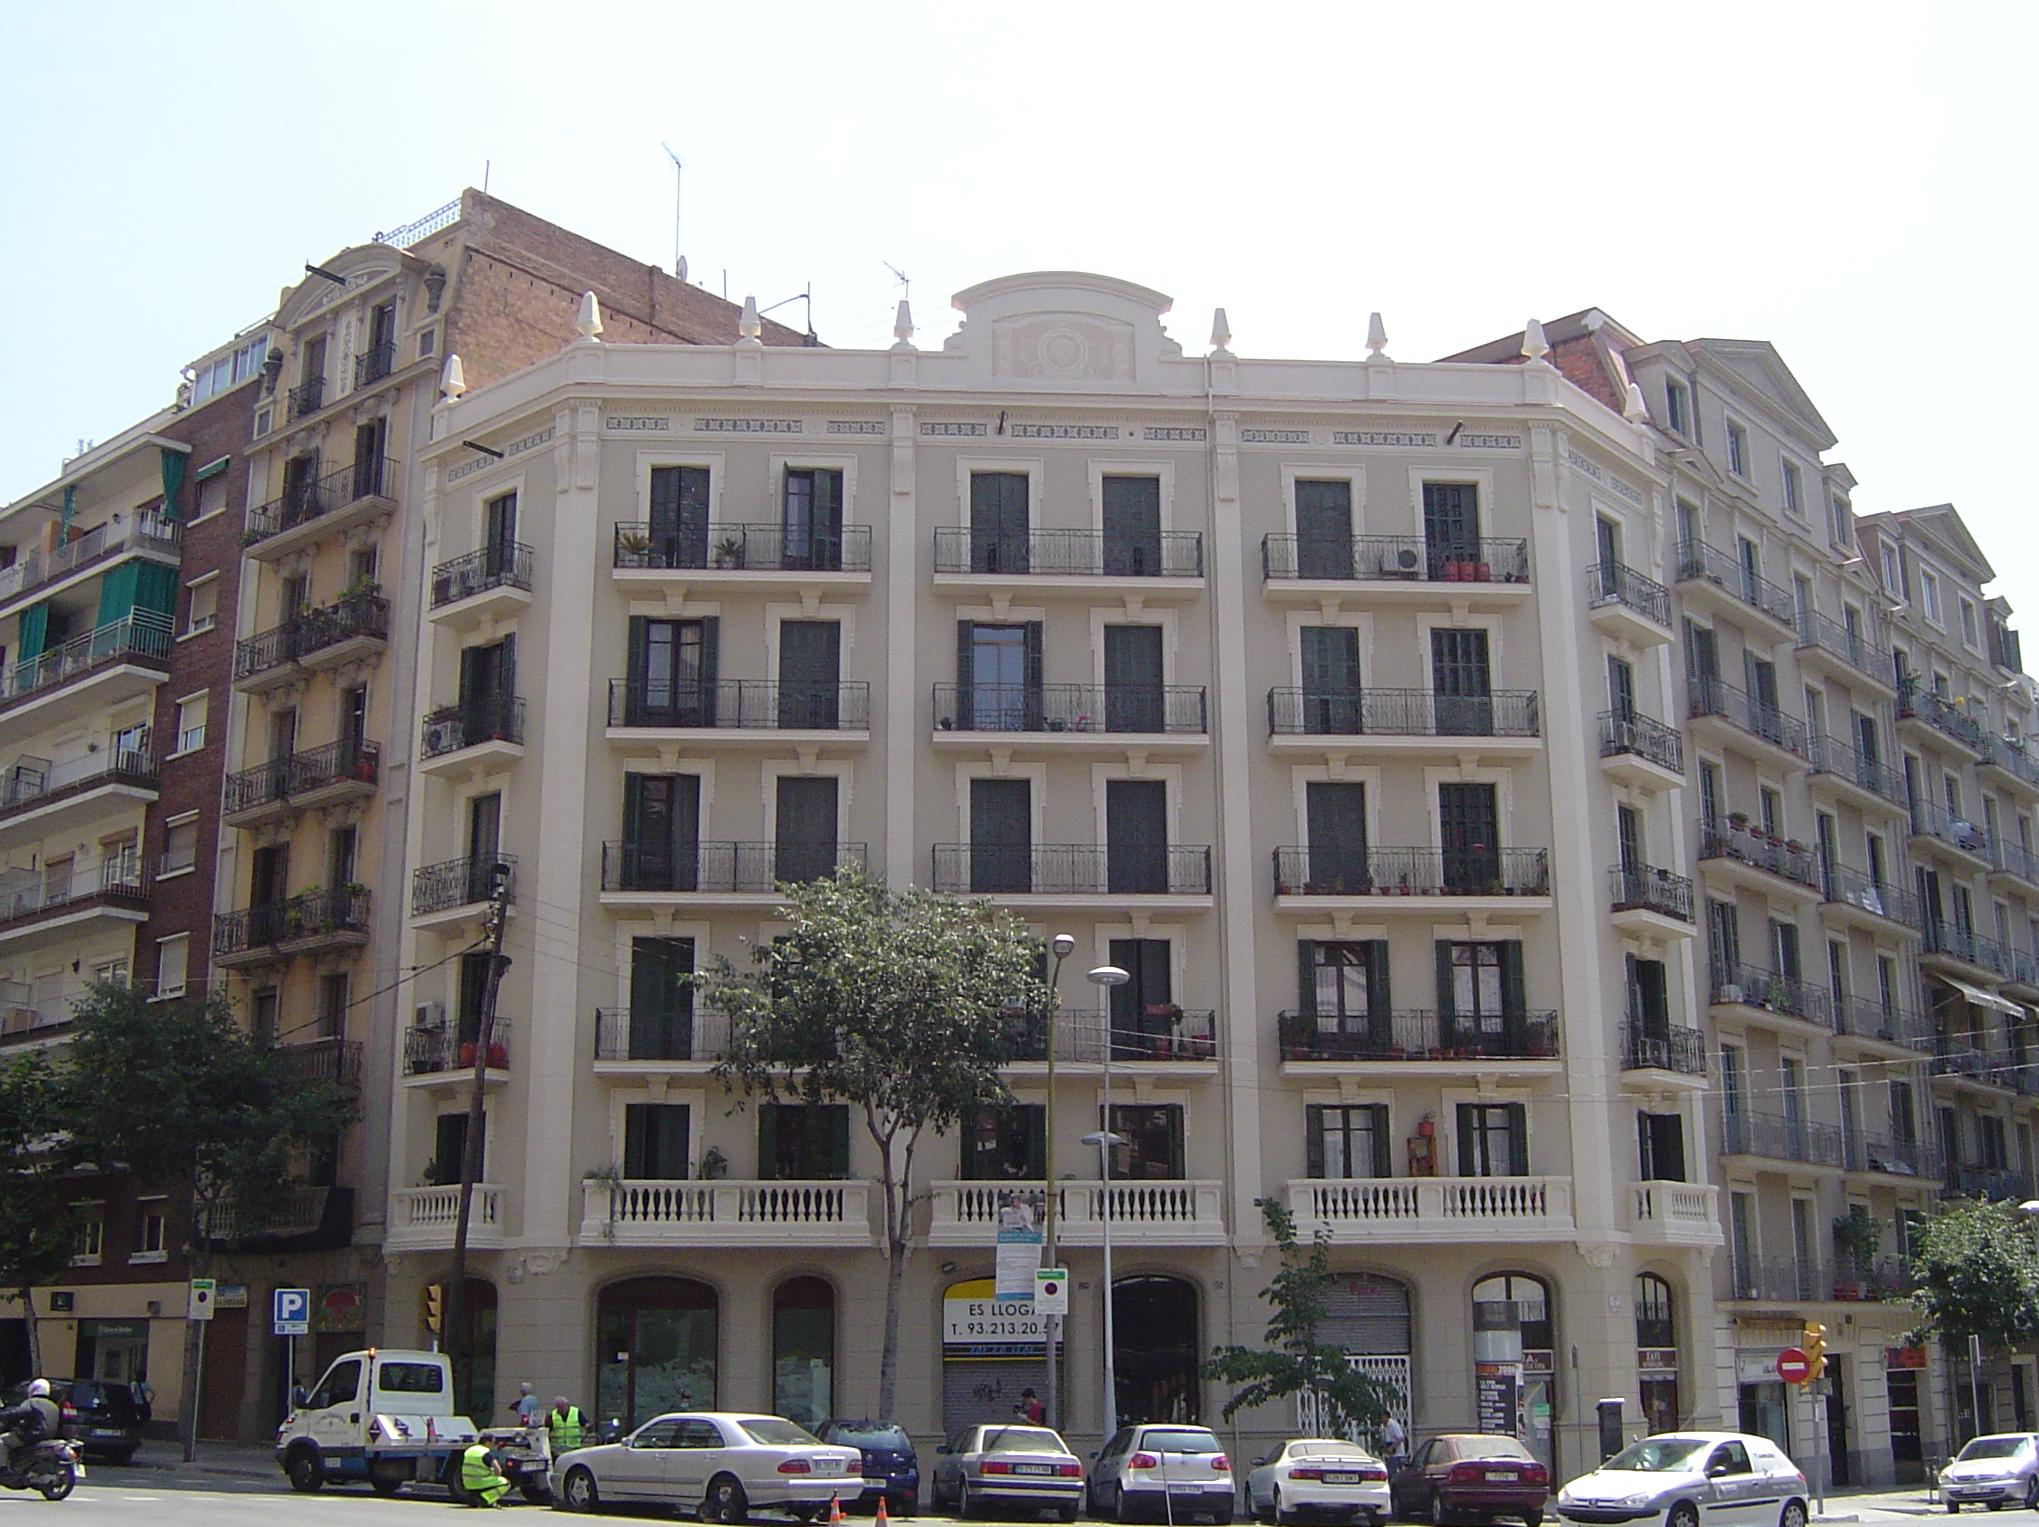 OBRA REALIZADA: C/. ROSELLÓN, 320 BARCELONA